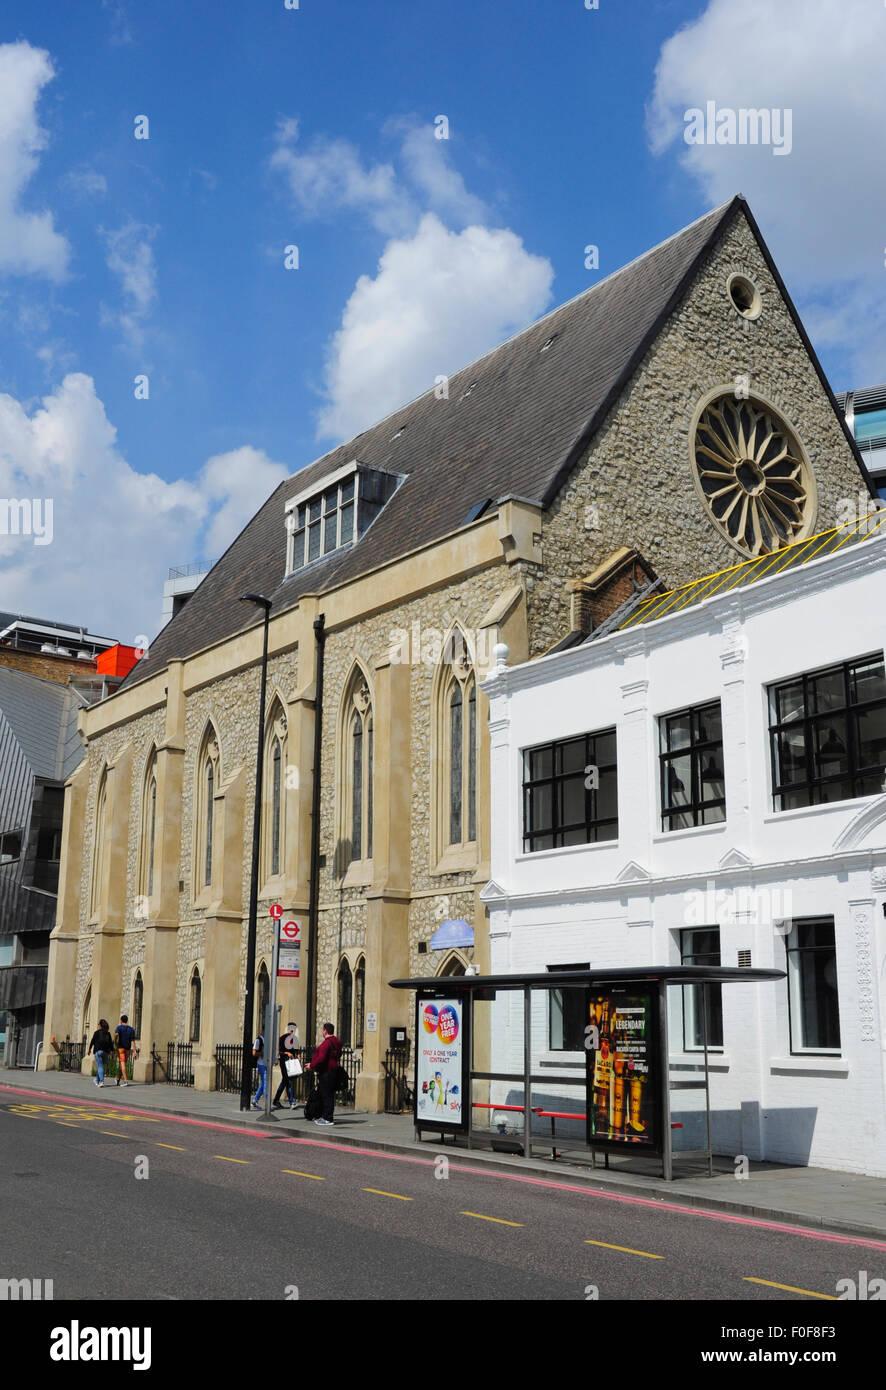 Christian Fellowship Church etíope en el Reino Unido, King's Cross Road Elevation, Londres, Inglaterra, Imagen De Stock